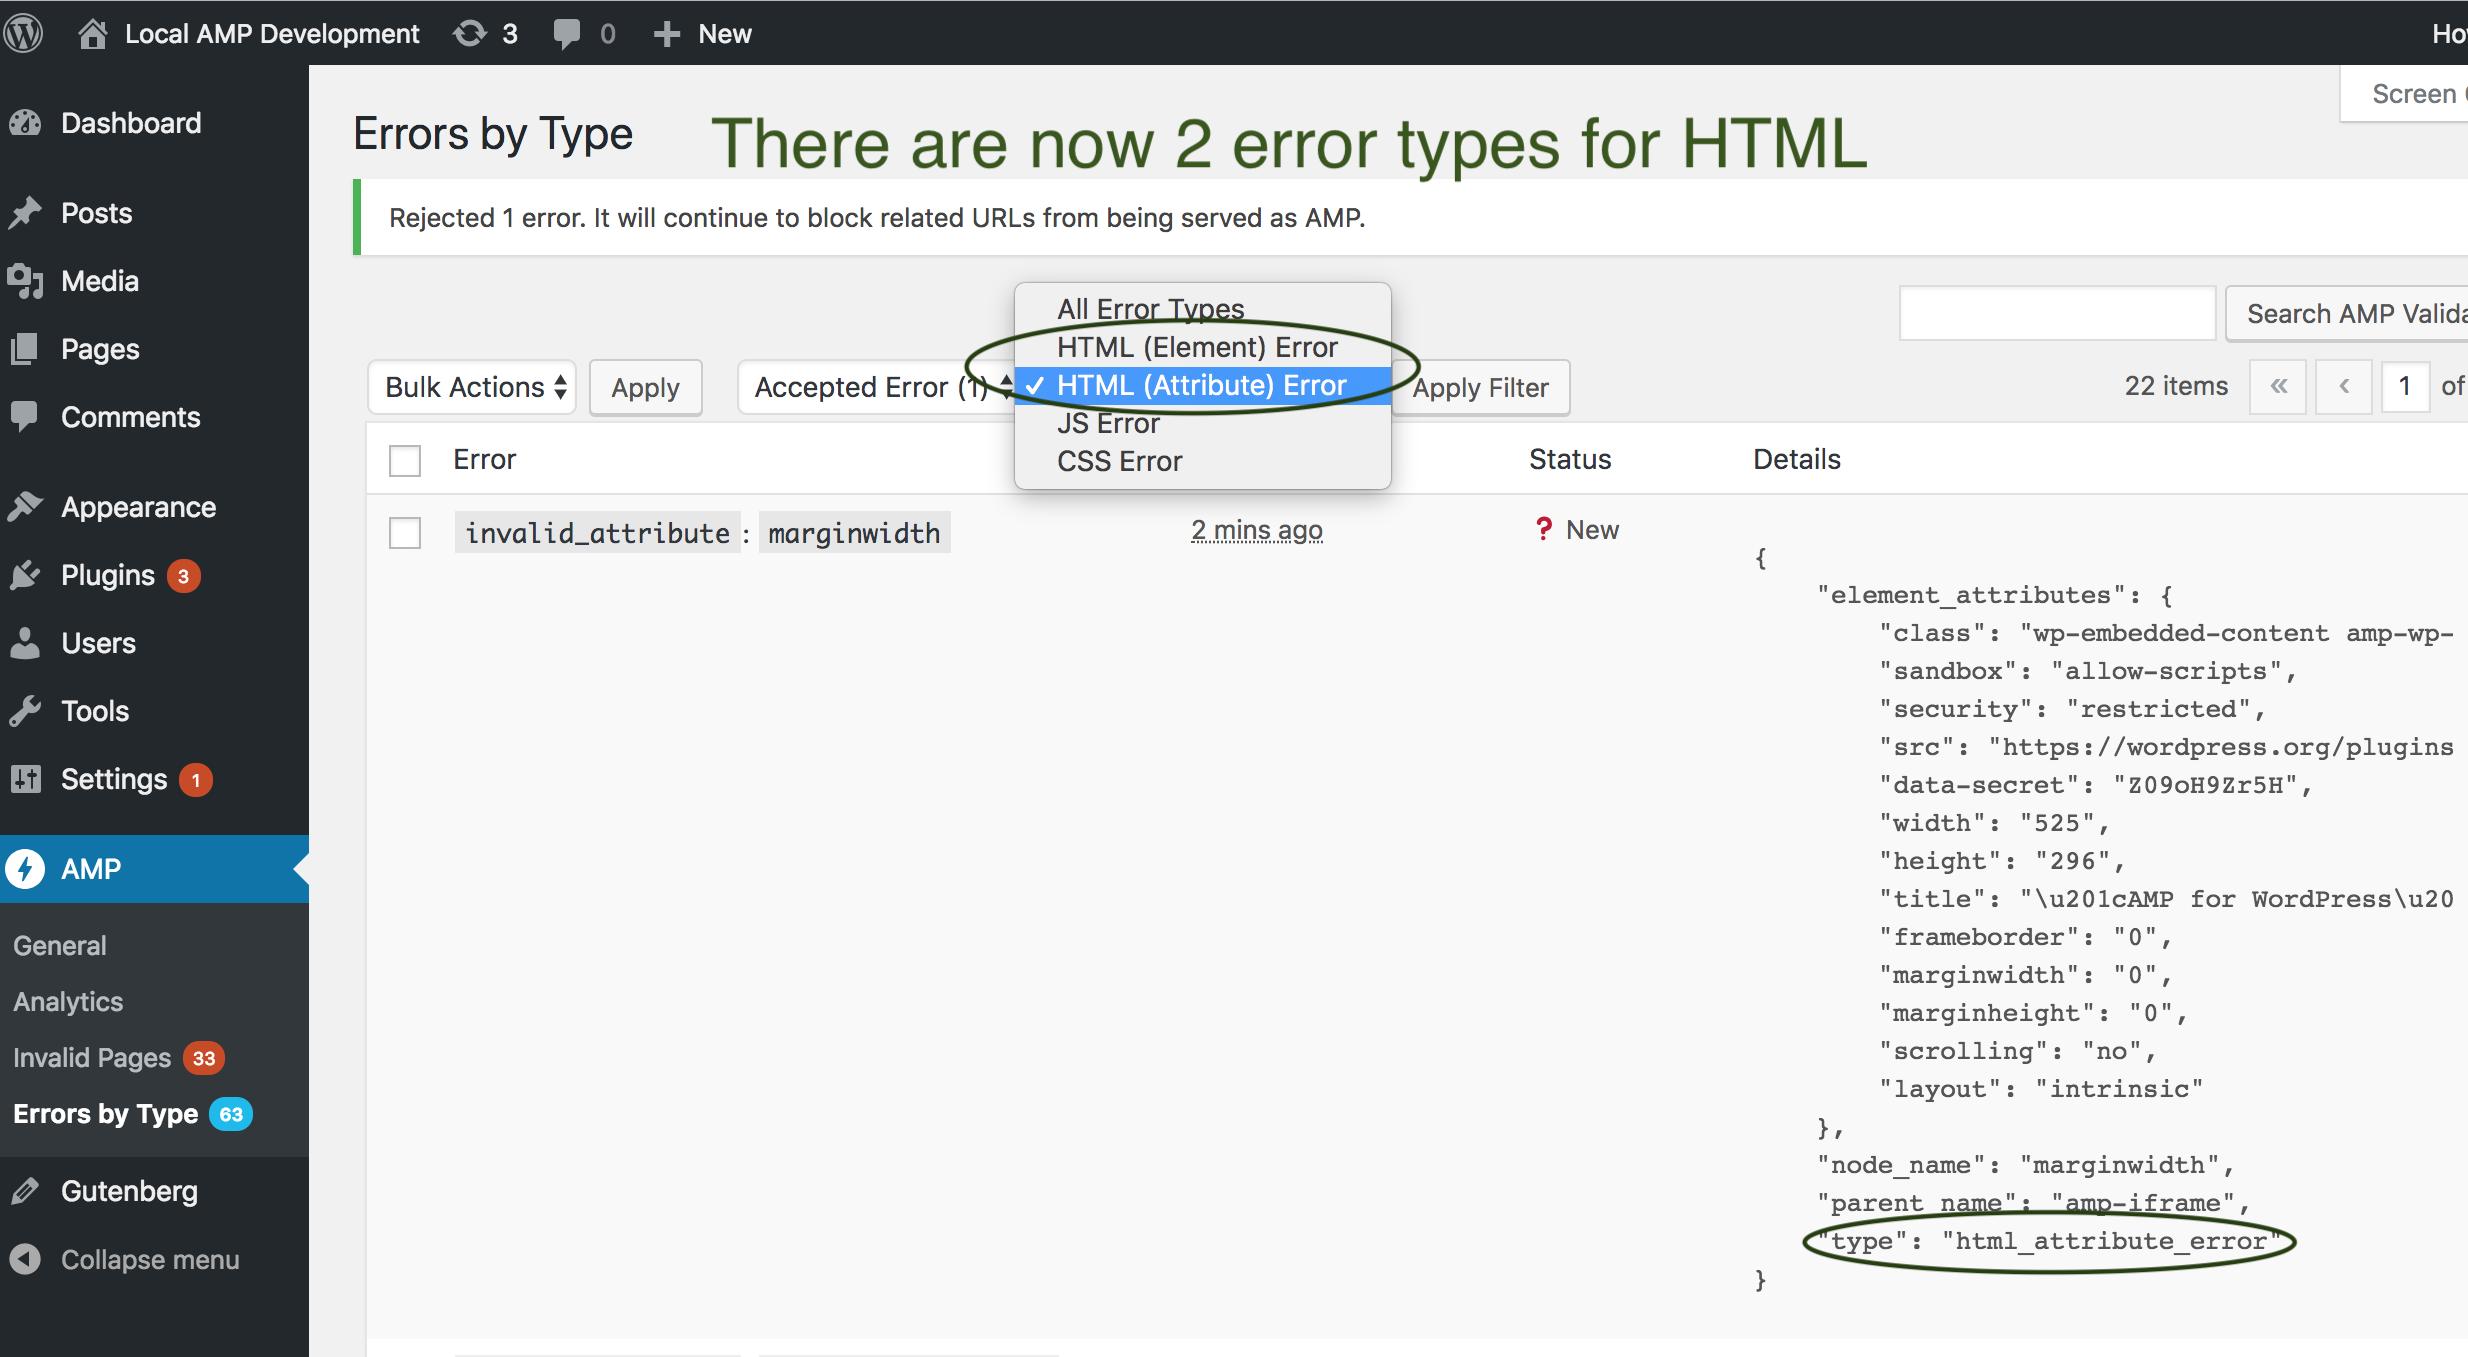 2-error-types-html